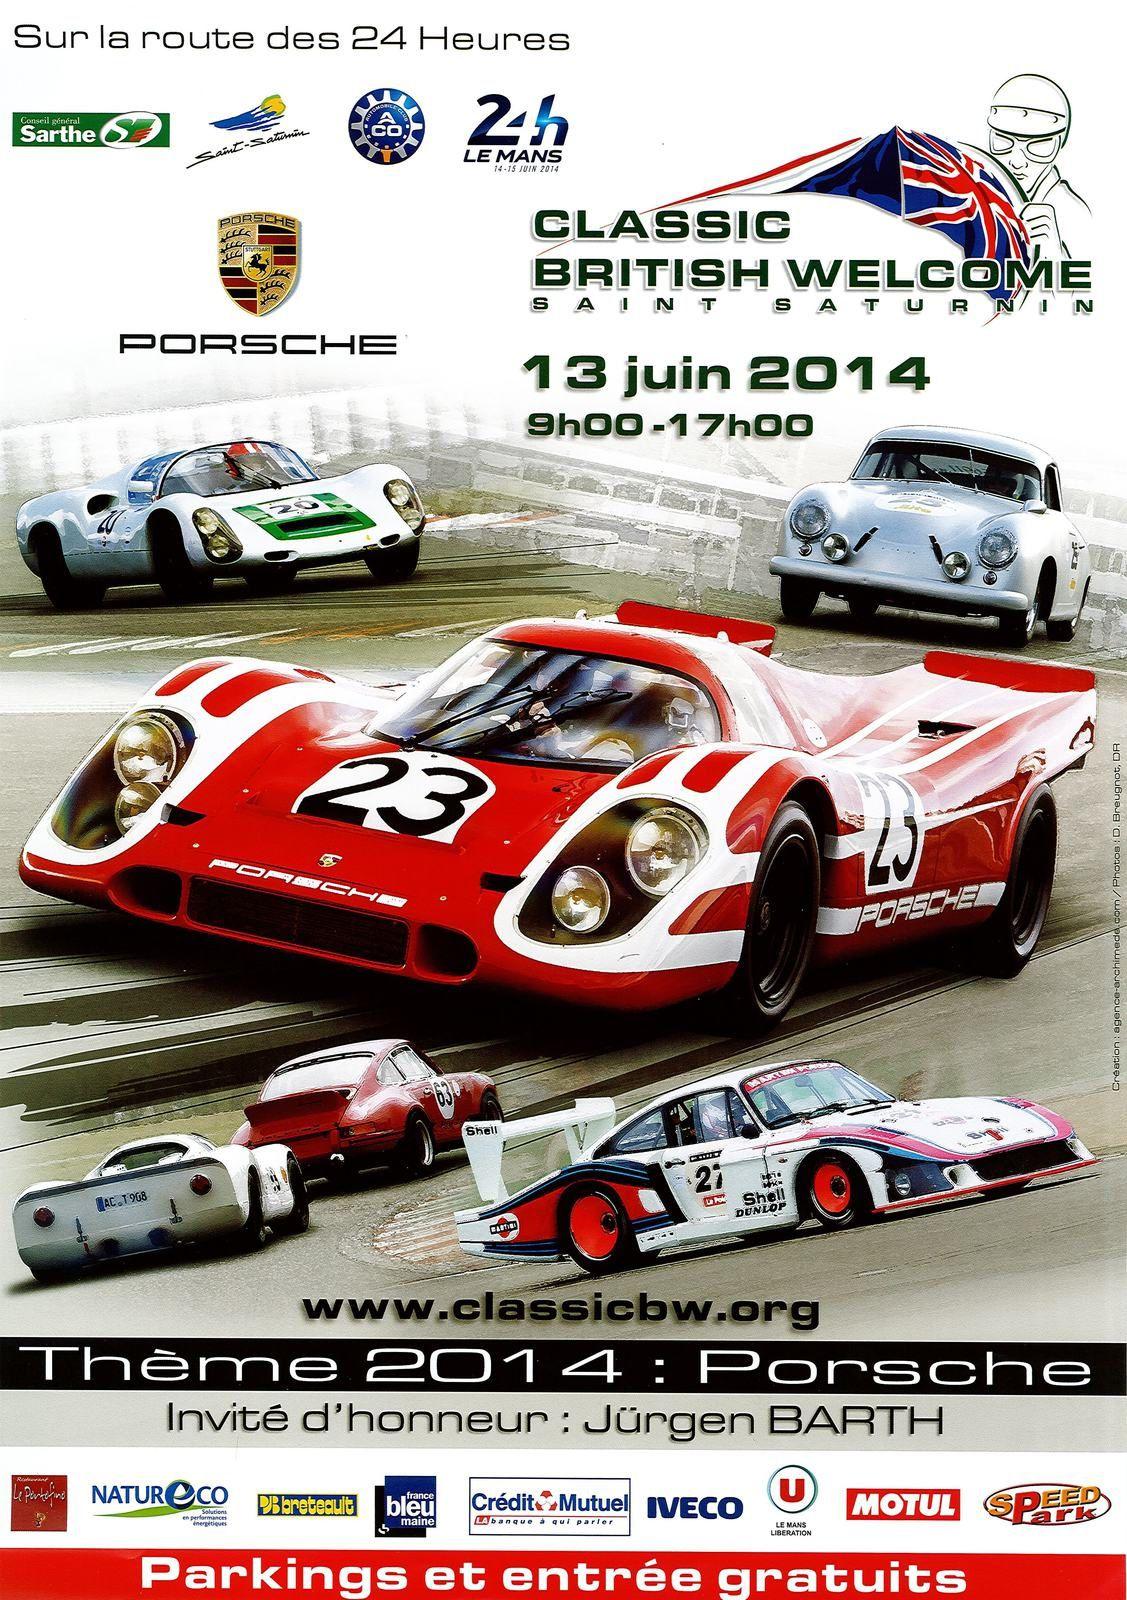 Affiche CLASSIC BRITISH WELCOME 2014 (saint saturnin, sarthe, 24H du Mans)